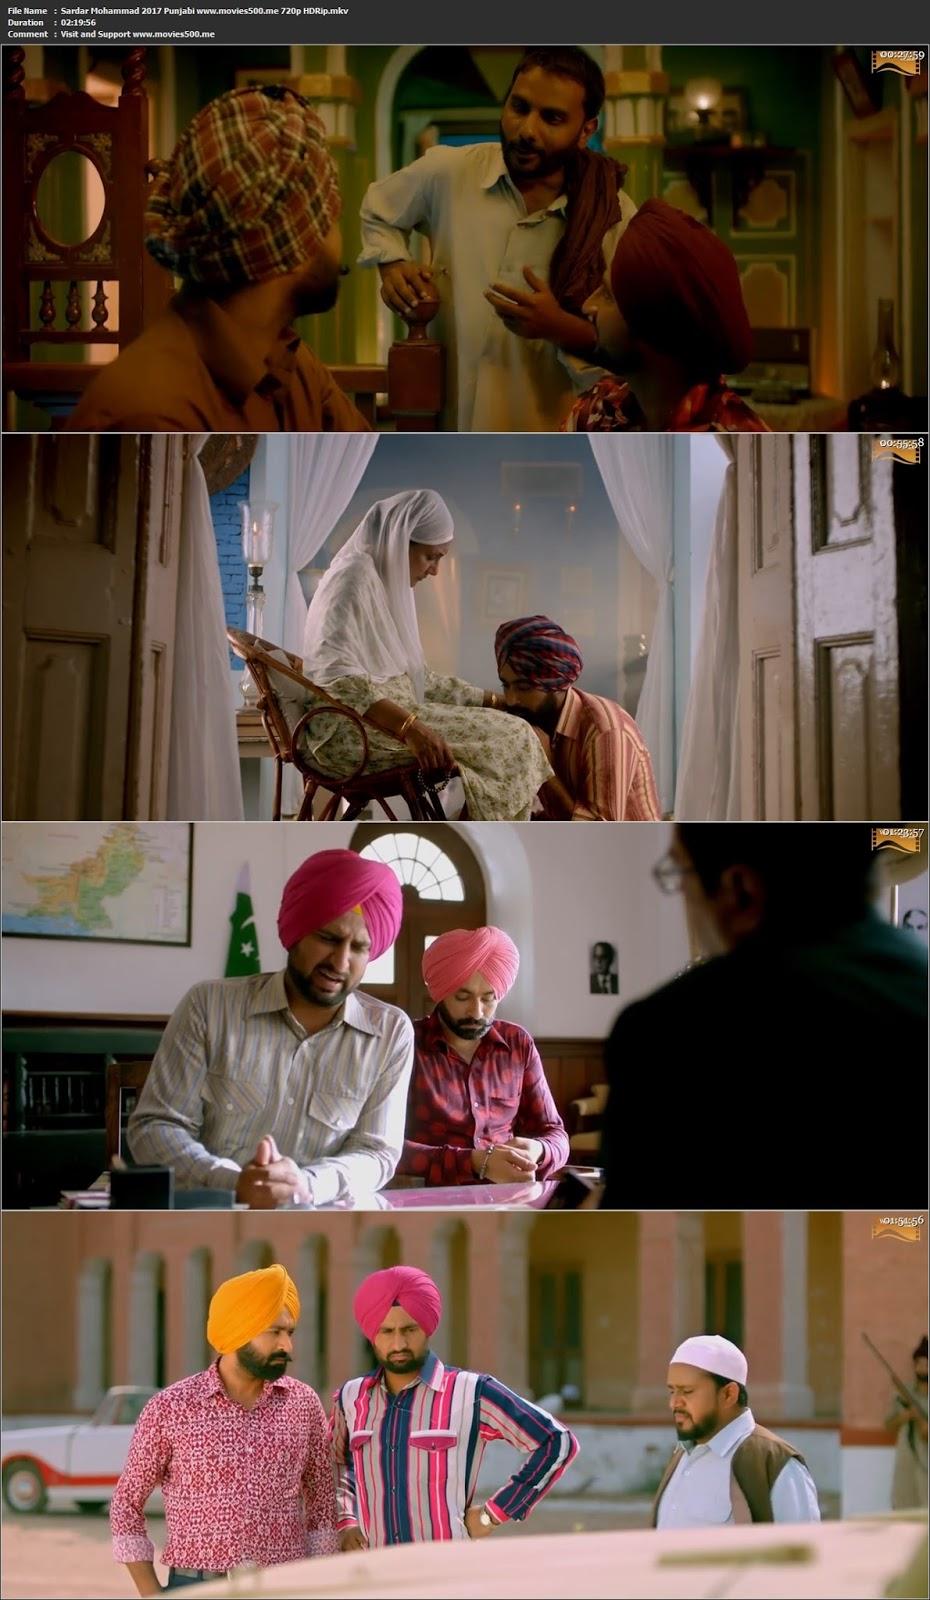 Sardar Mohammad 2017 Punjabi Full Movie HDRip 720p at newbtcbank.com